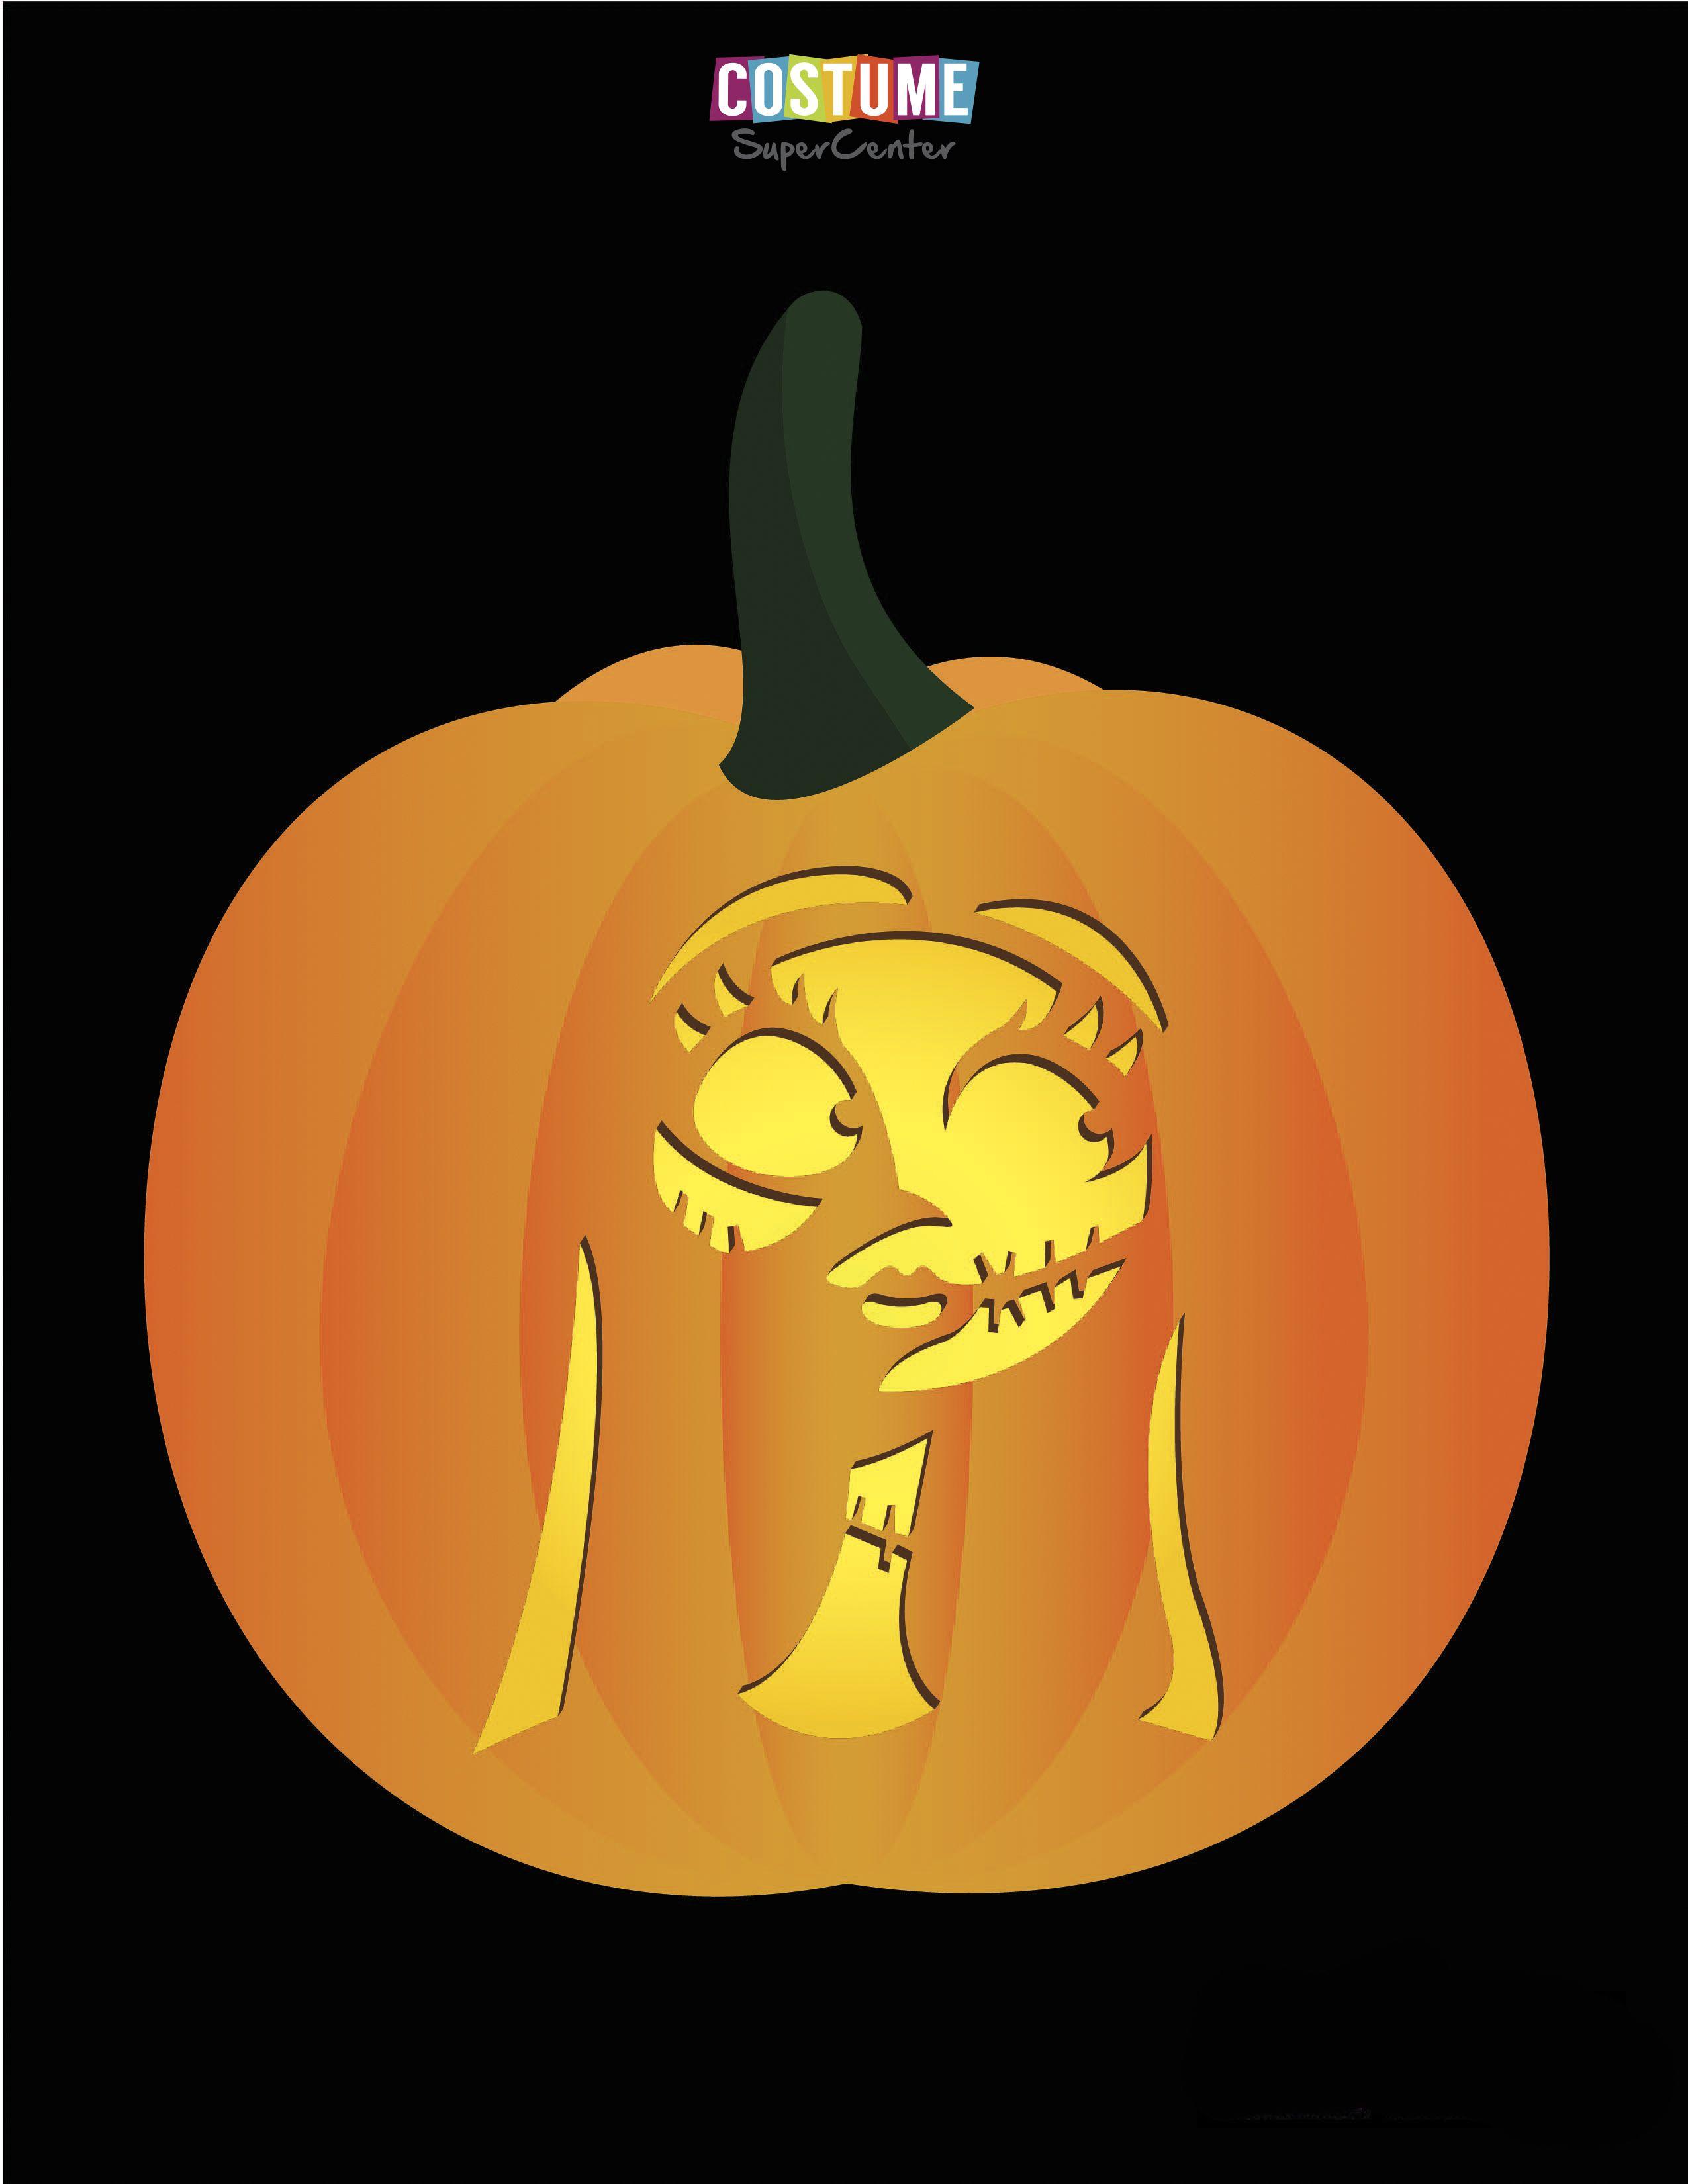 Nightmare Before Christmas Pumpkin Carving Stencils | Pumpkin patch ...